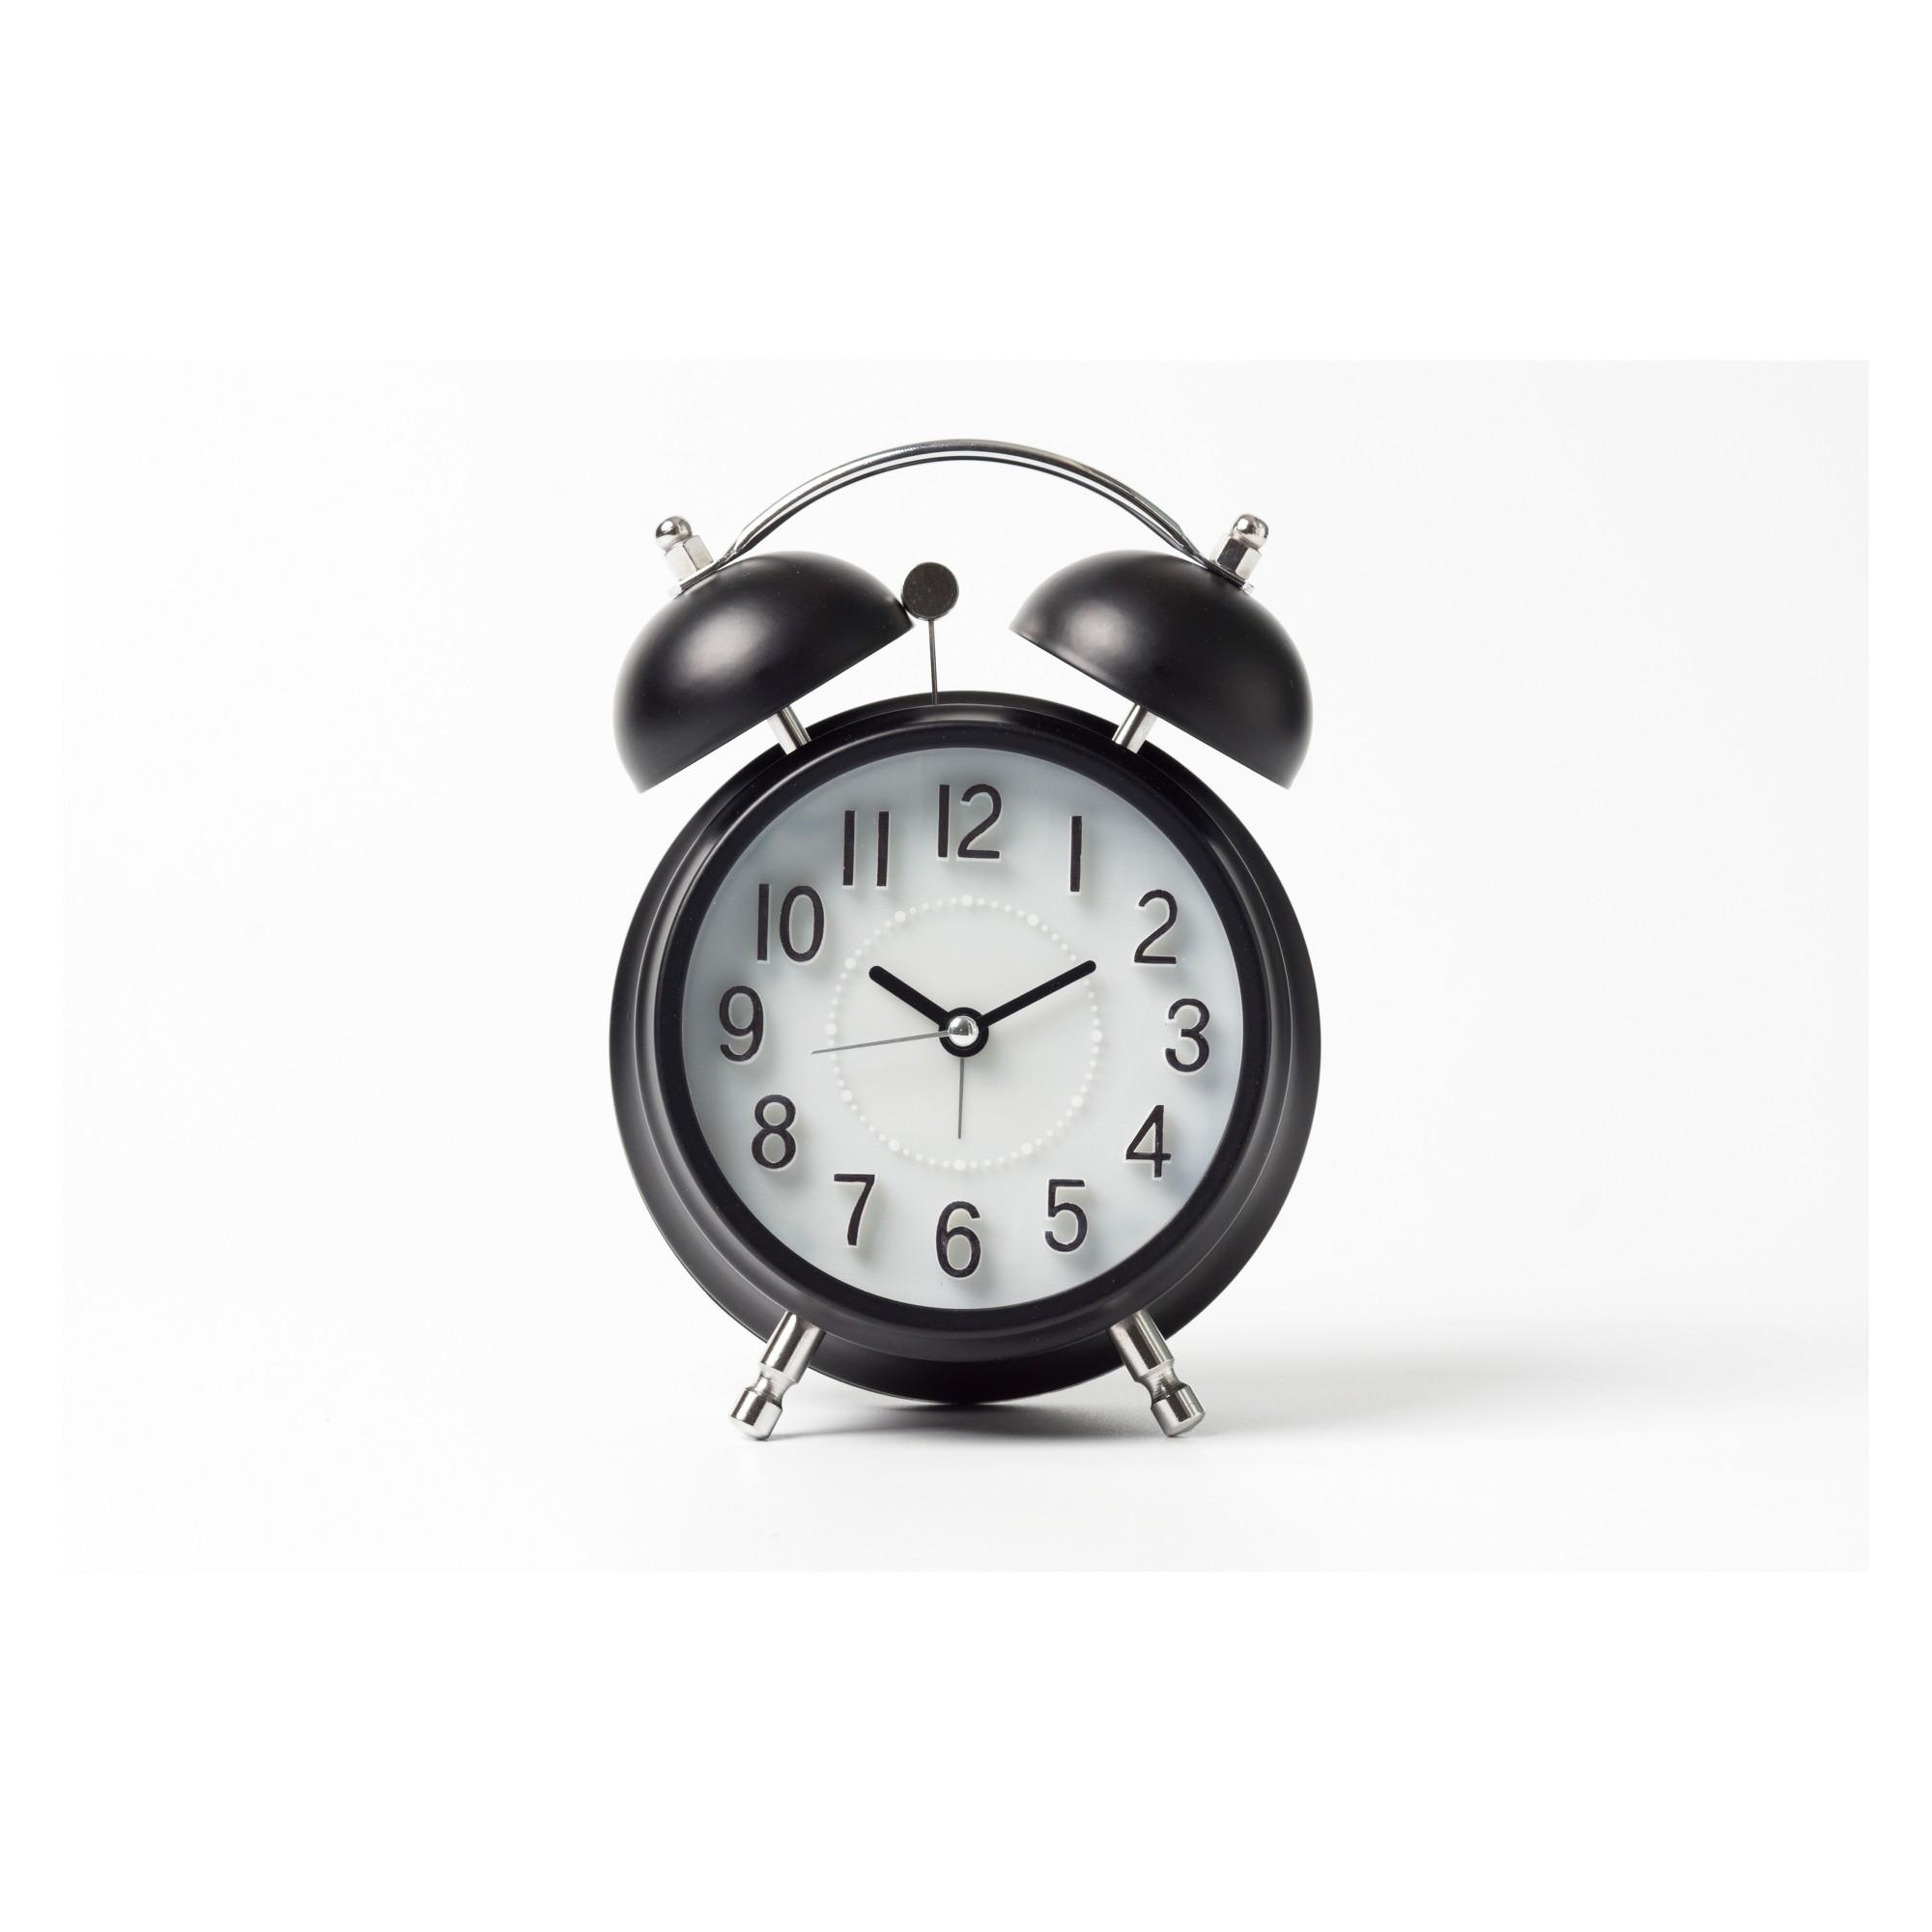 Vintage Modern Twin Bell Alarm Table Clock Black Silver Crosley Vintage Alarm Clocks Analog Alarm Clock Alarm Clock